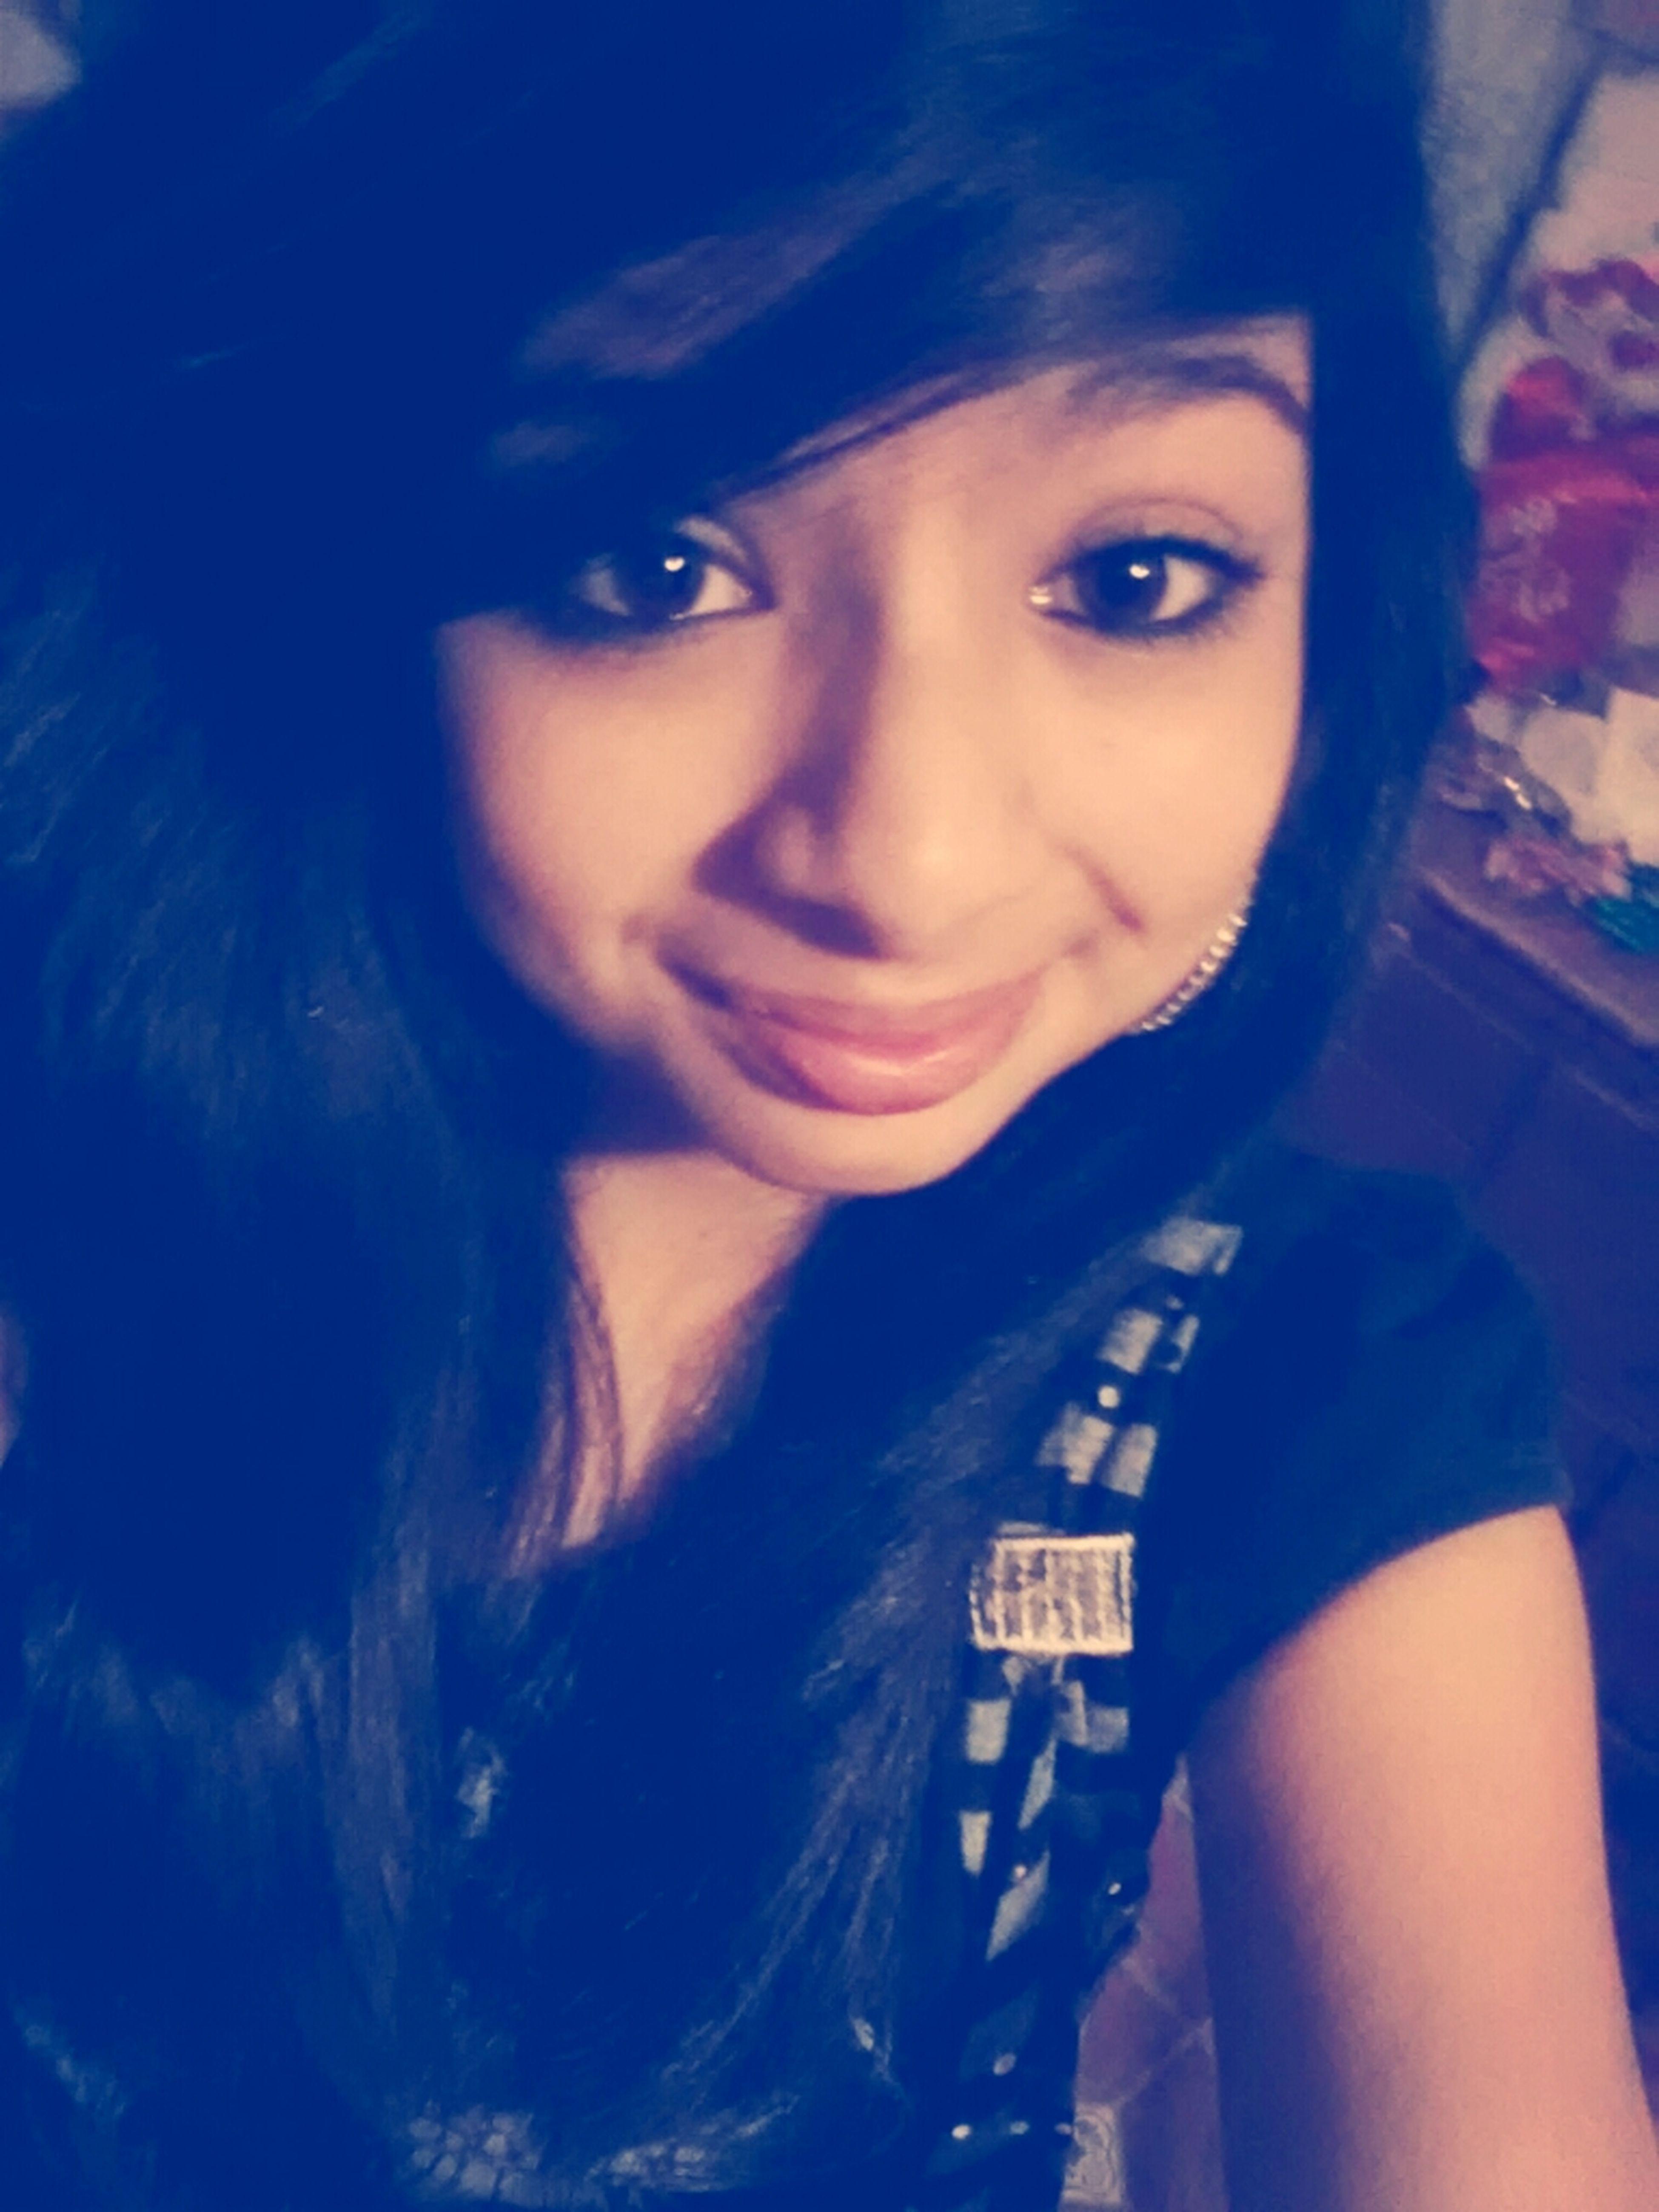 Smile (: 1*2*13